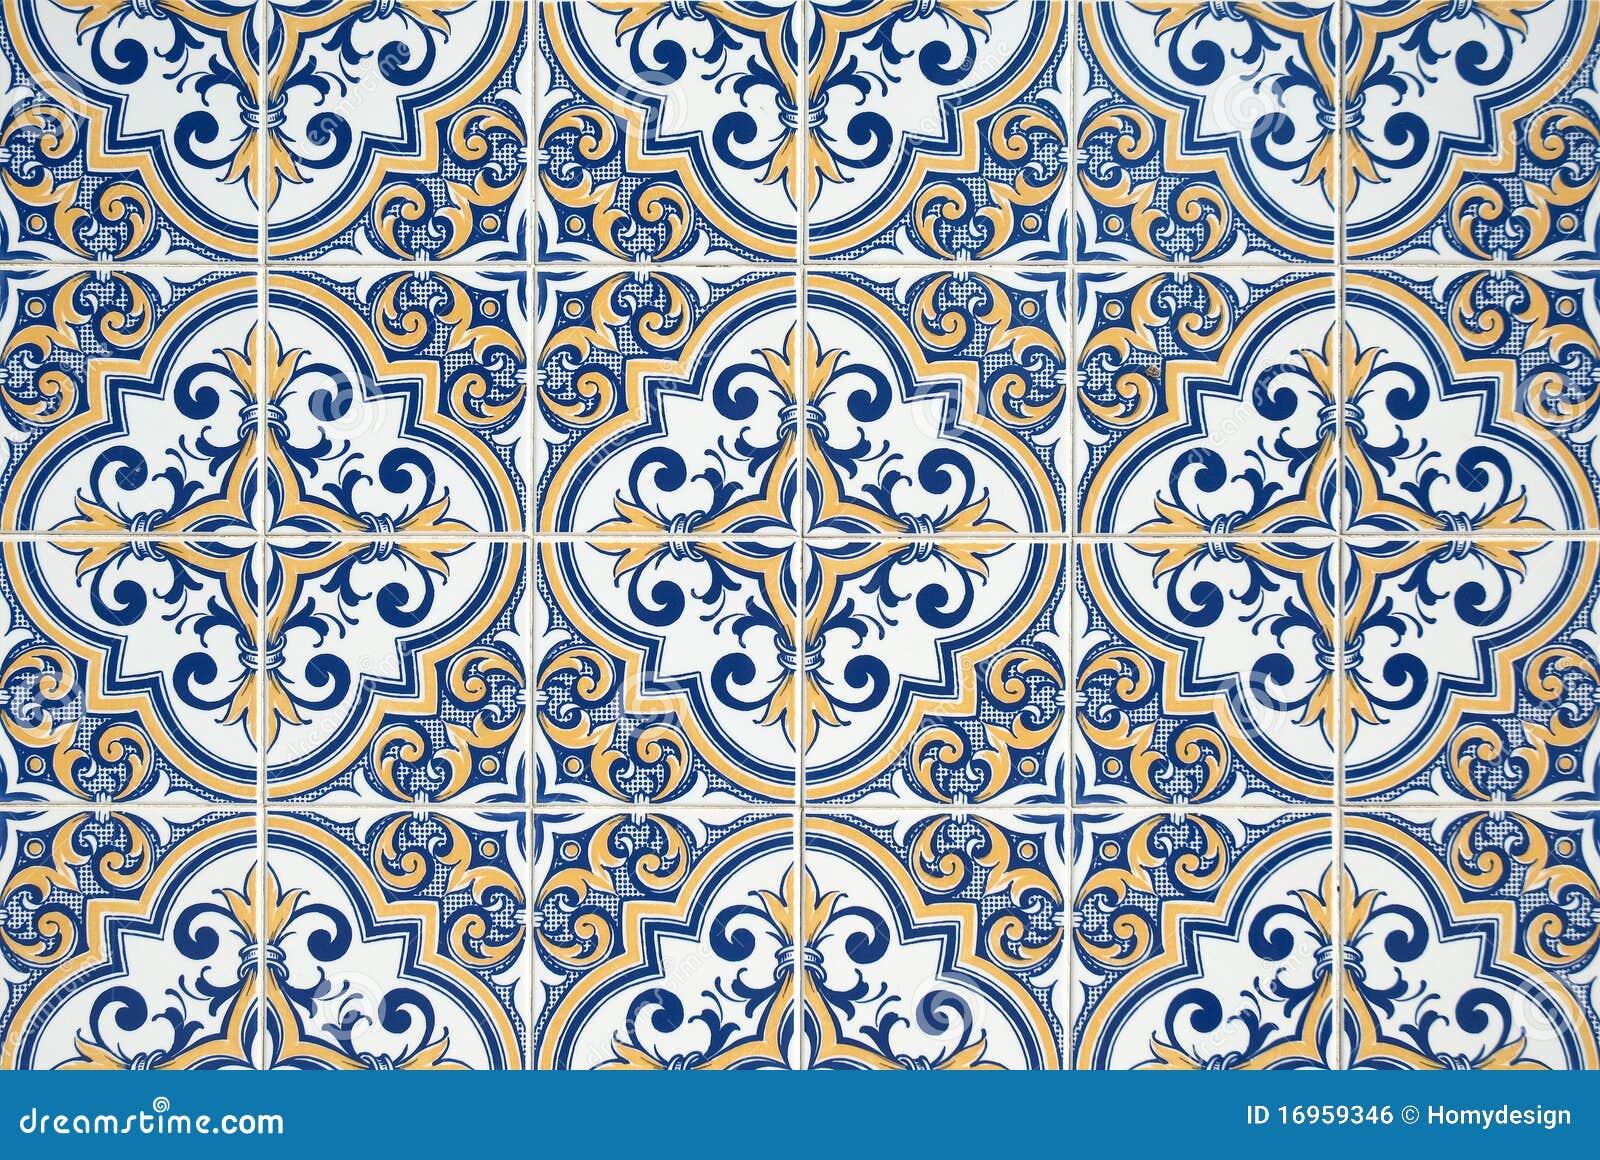 azulejos portugueses tradicionais foto de stock imagem. Black Bedroom Furniture Sets. Home Design Ideas